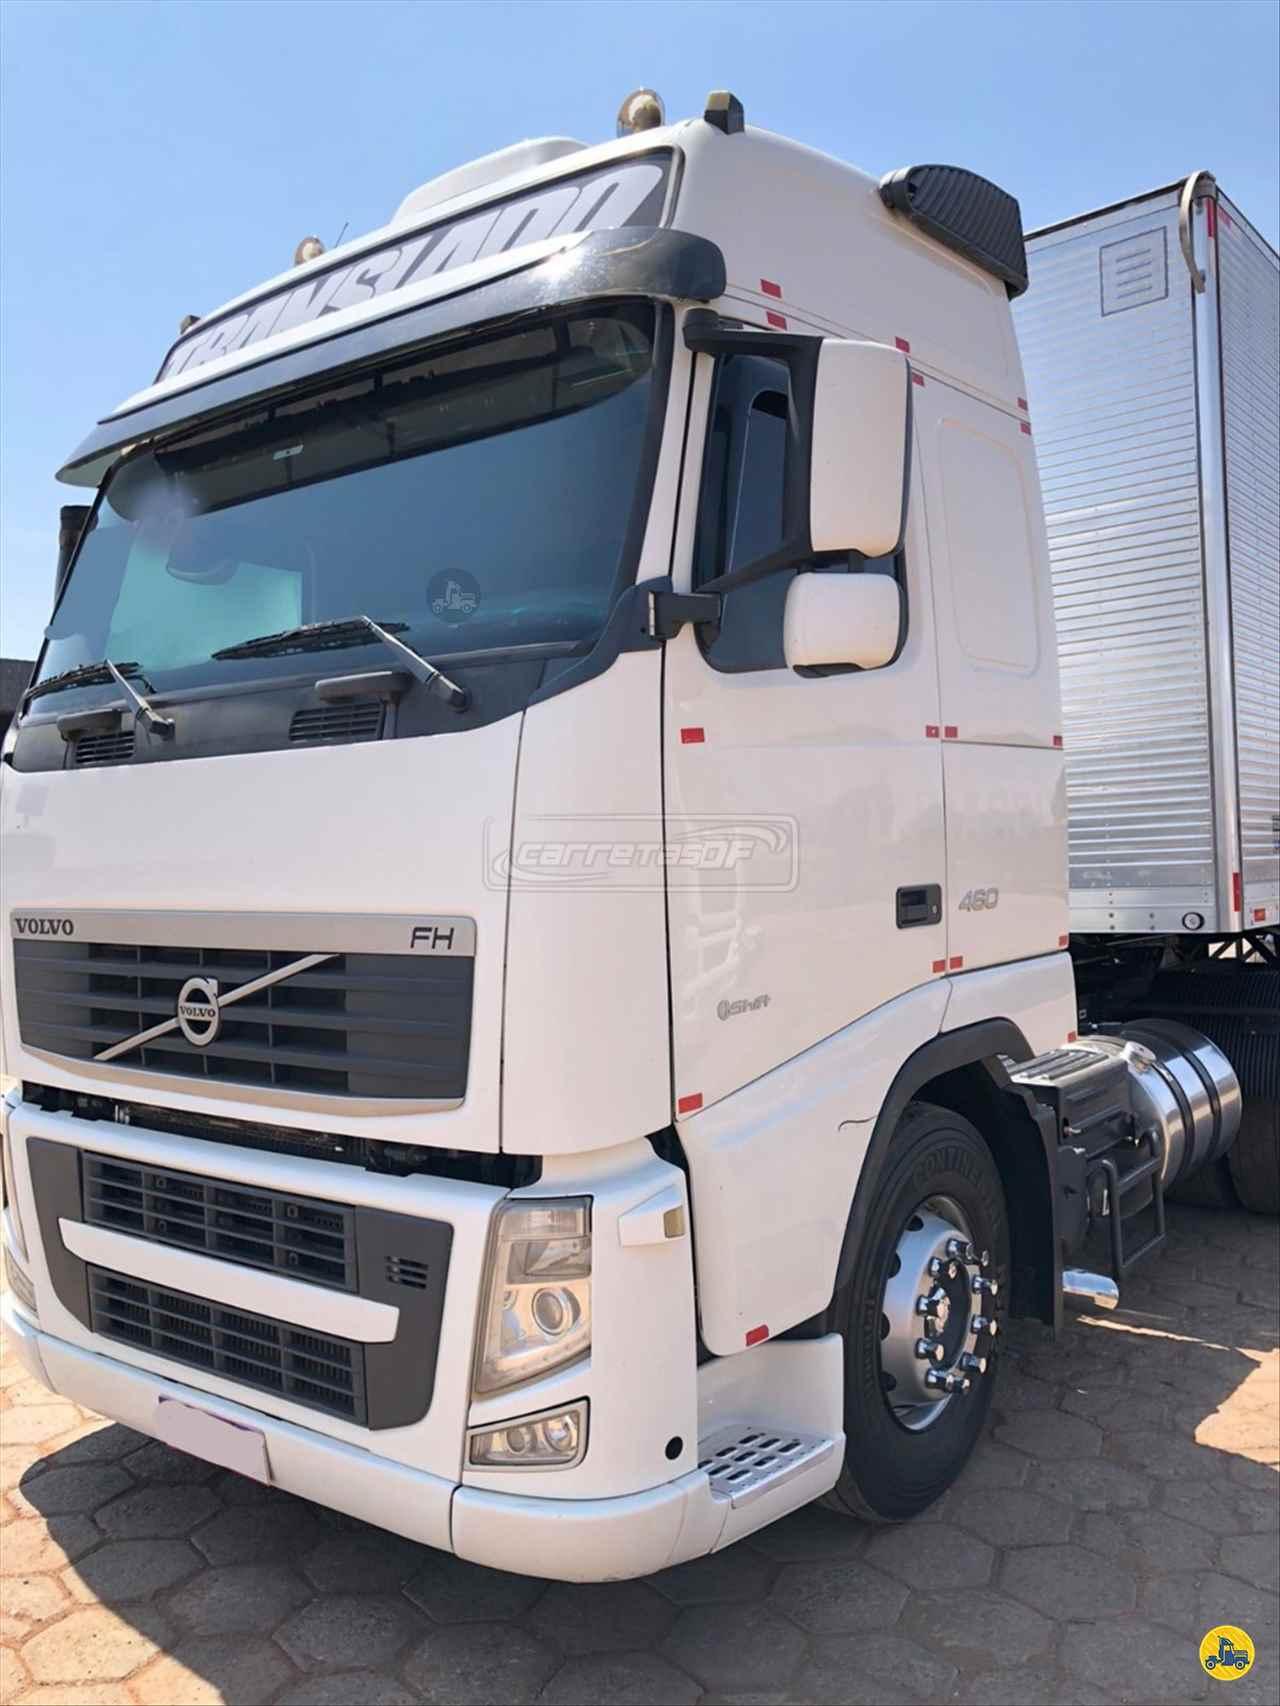 CAMINHAO VOLVO VOLVO FH 460 Cavalo Mecânico Truck 6x2 CARRETAS DF - NOMA BRASILIA DISTRITO FEDERAL DF